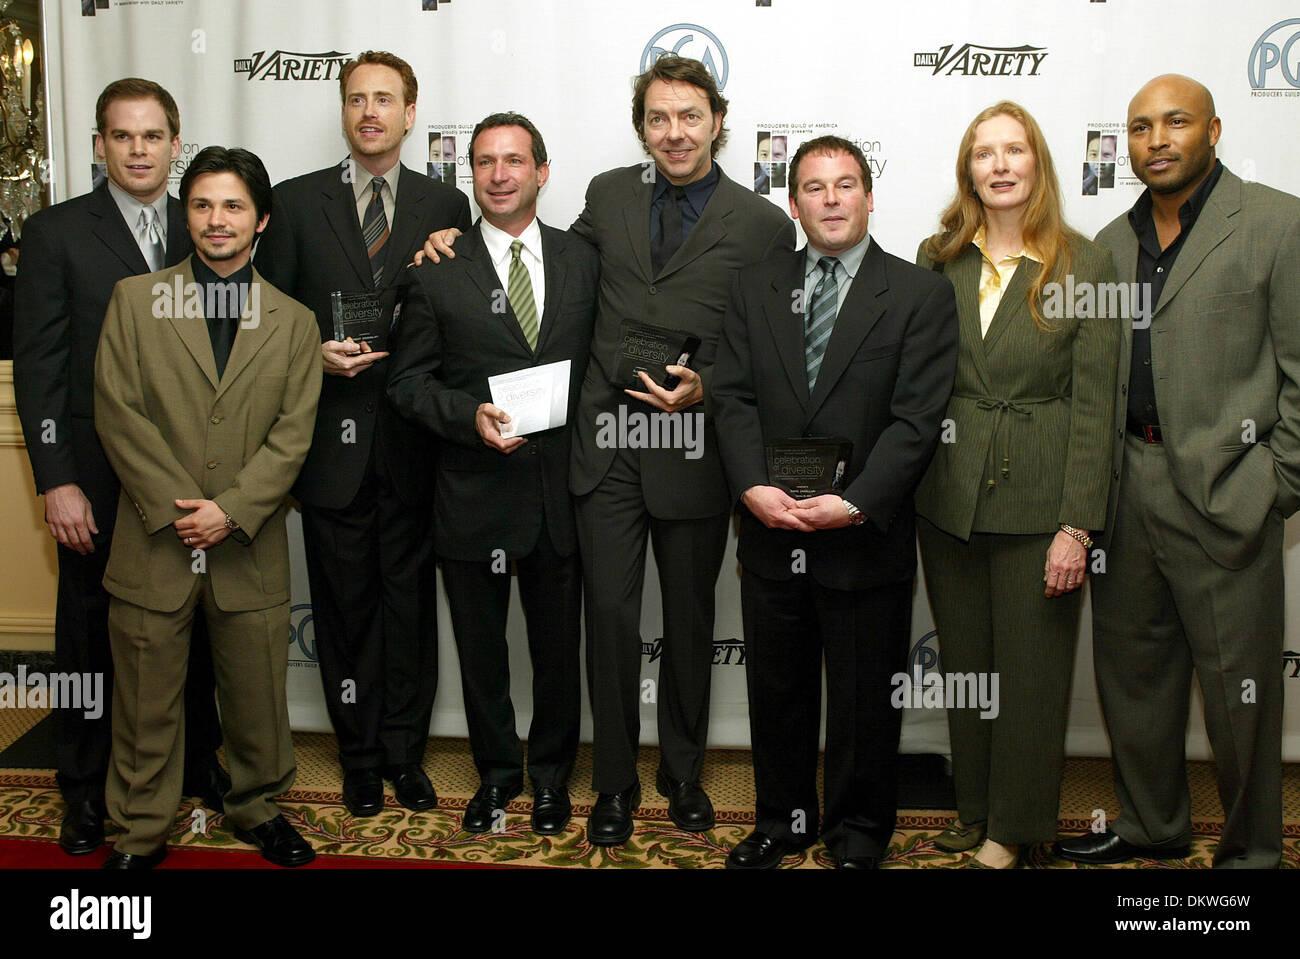 6 Feet Under Cast Alan Ball Cast Producers 6 Feet Under Beverly Hills L A Usa Regent Beverly Wlshireel  Lac10449